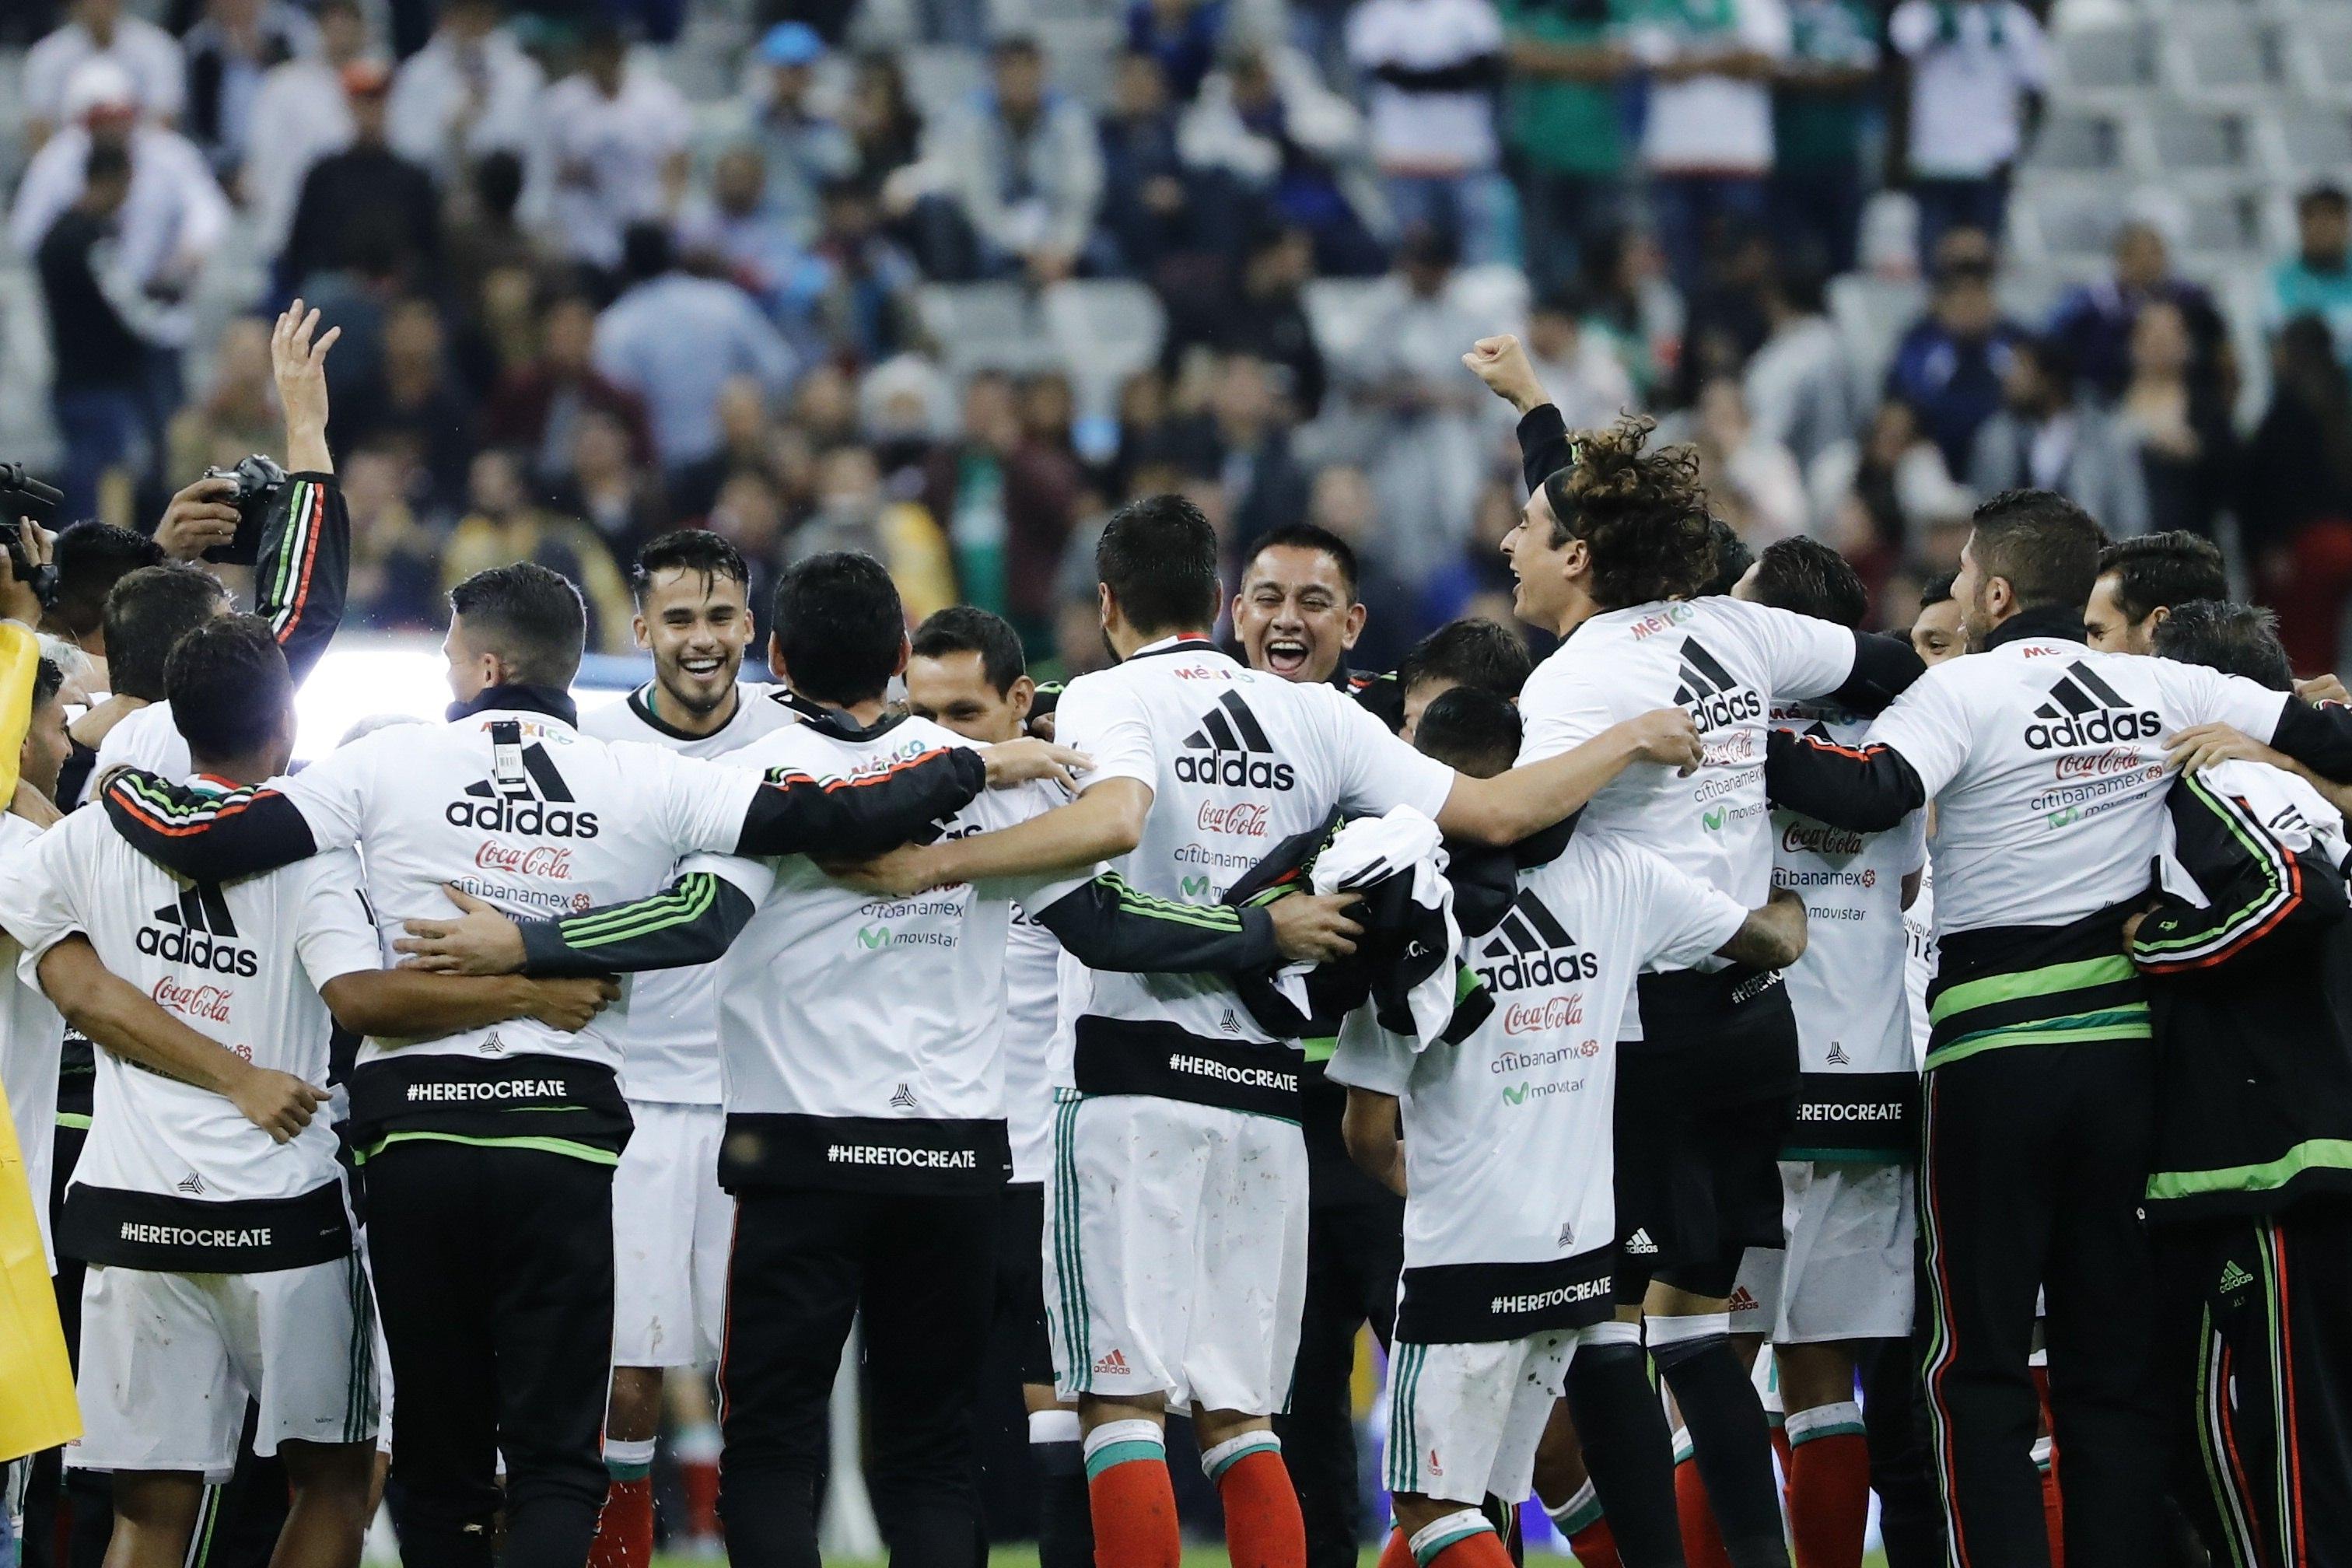 México se classifica para Copa do Mundo 2018